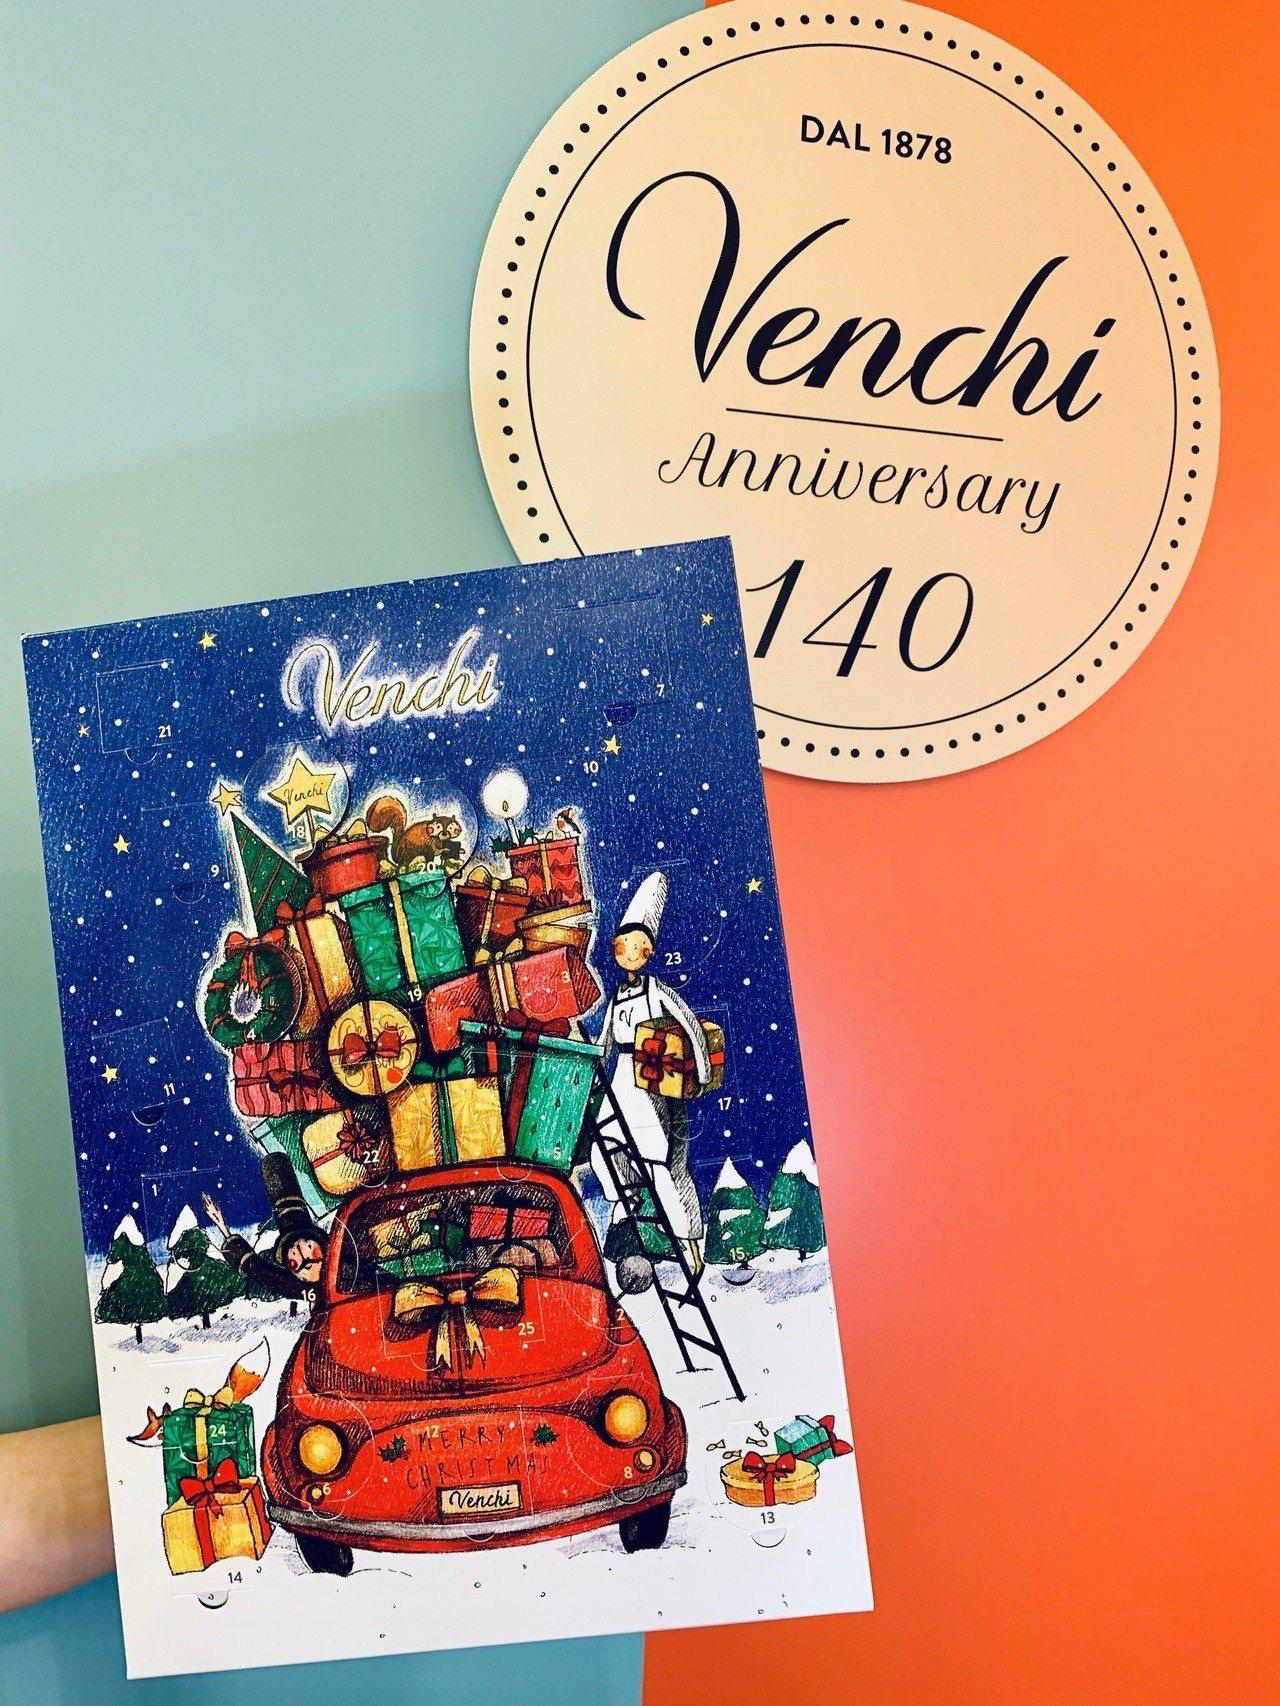 Venchi夢幻耶誕節倒數月曆,售價680元。記者張芳瑜/攝影